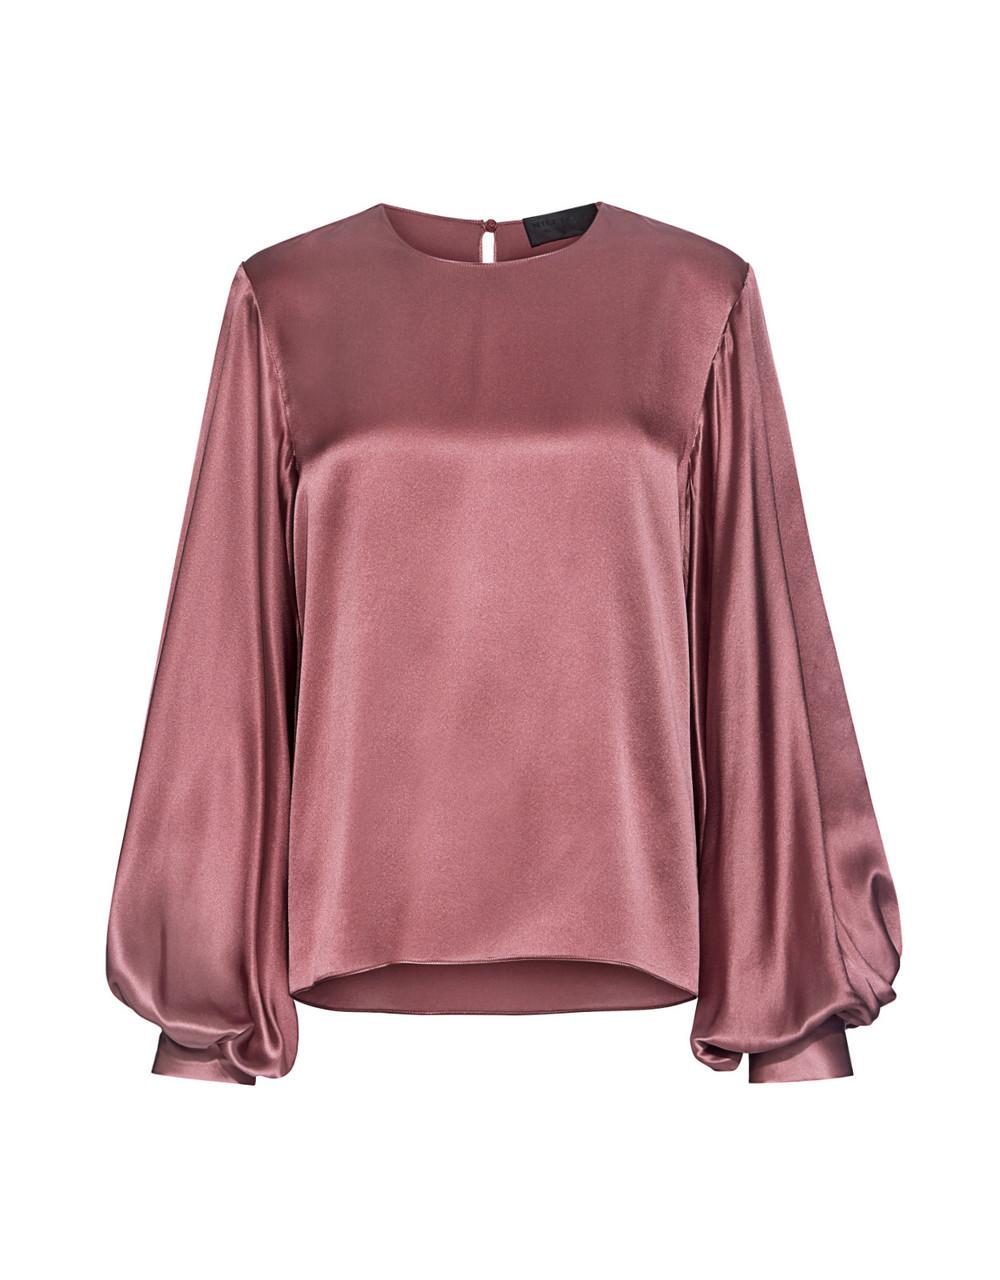 blouse back open open back silk pink satin top